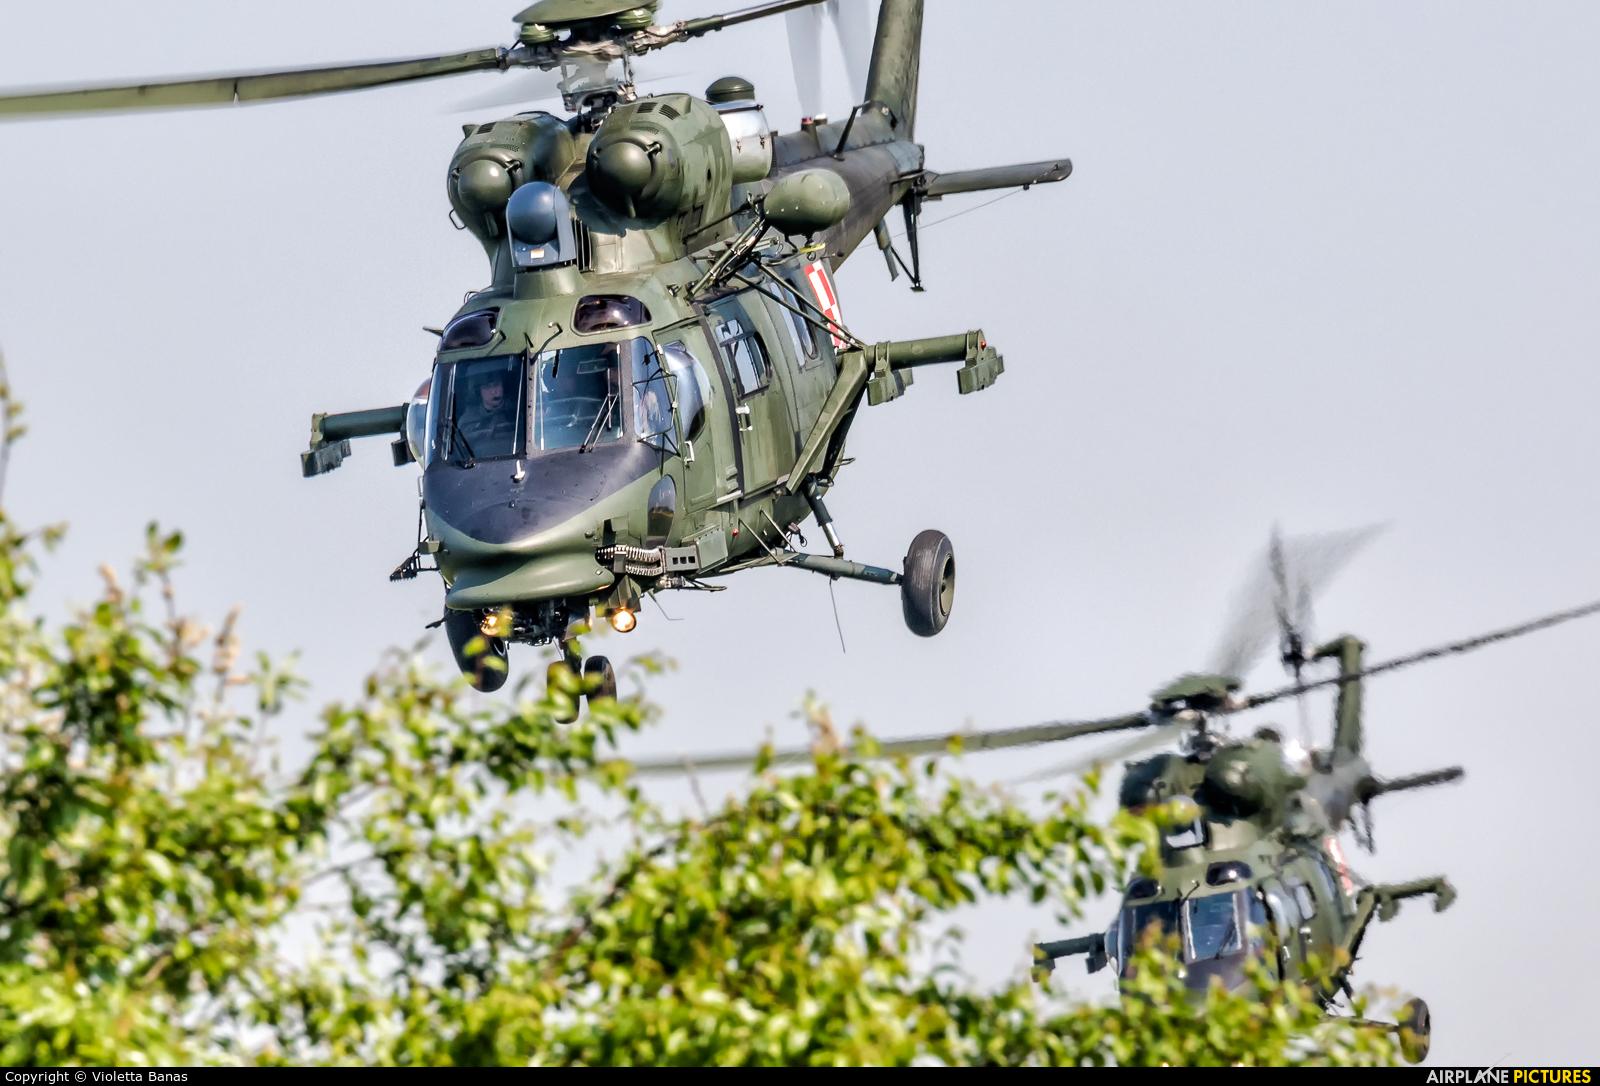 Poland - Army 0901 aircraft at Inowrocław - Latkowo